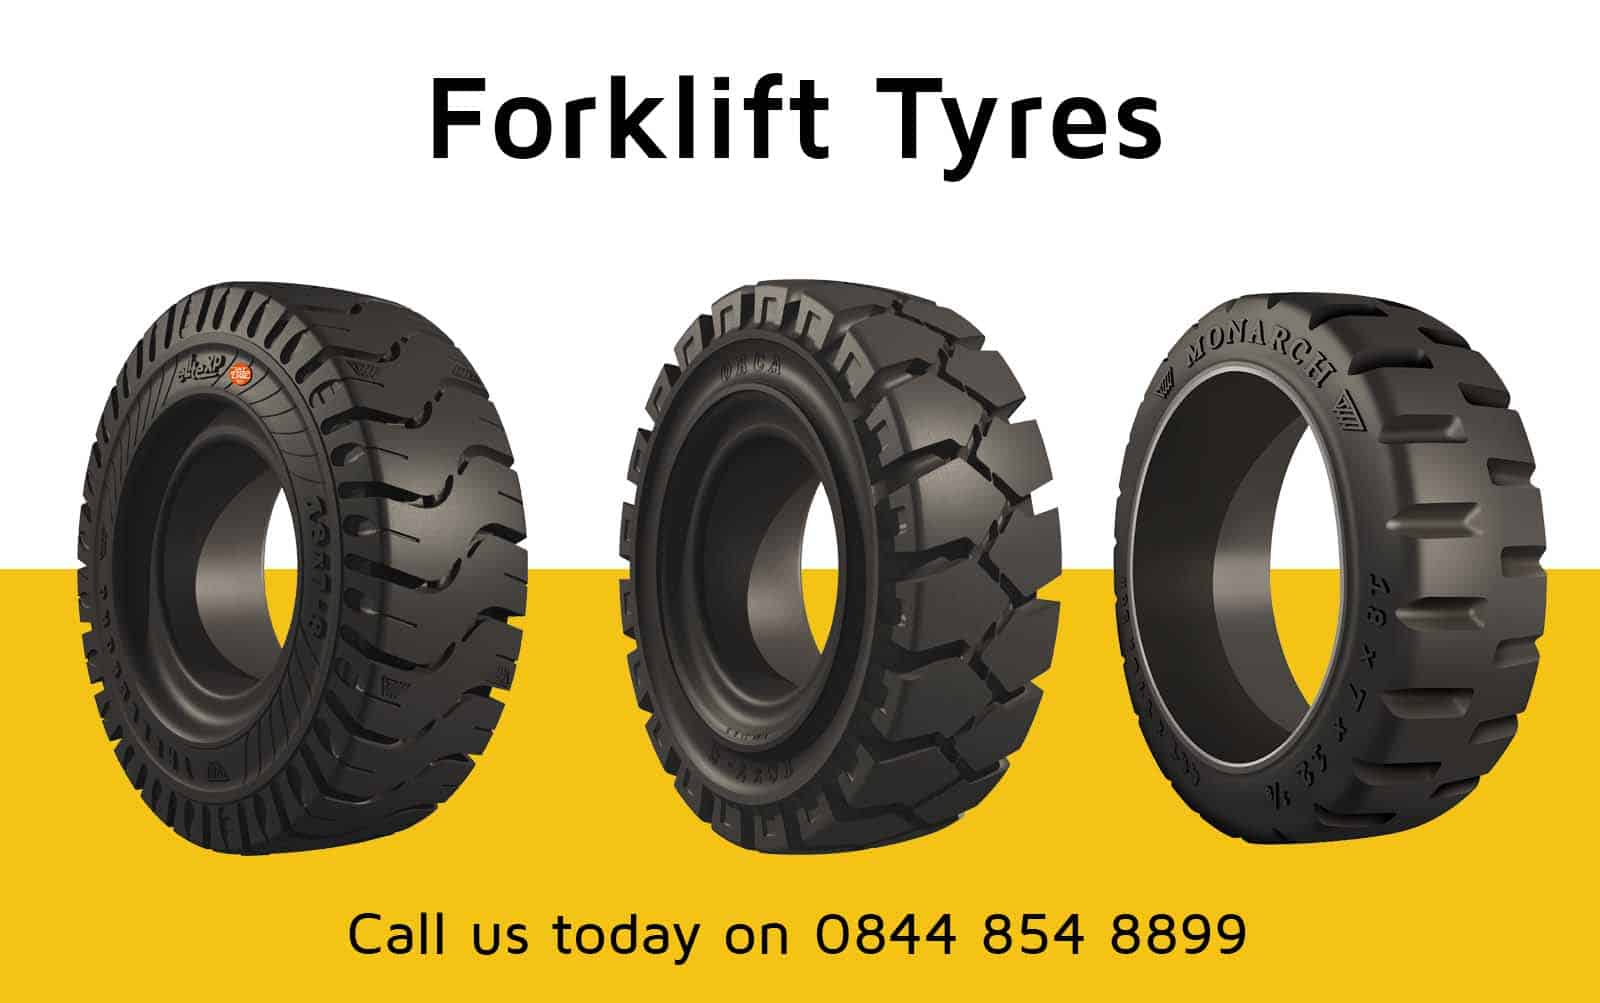 Forklift Tyres for sale